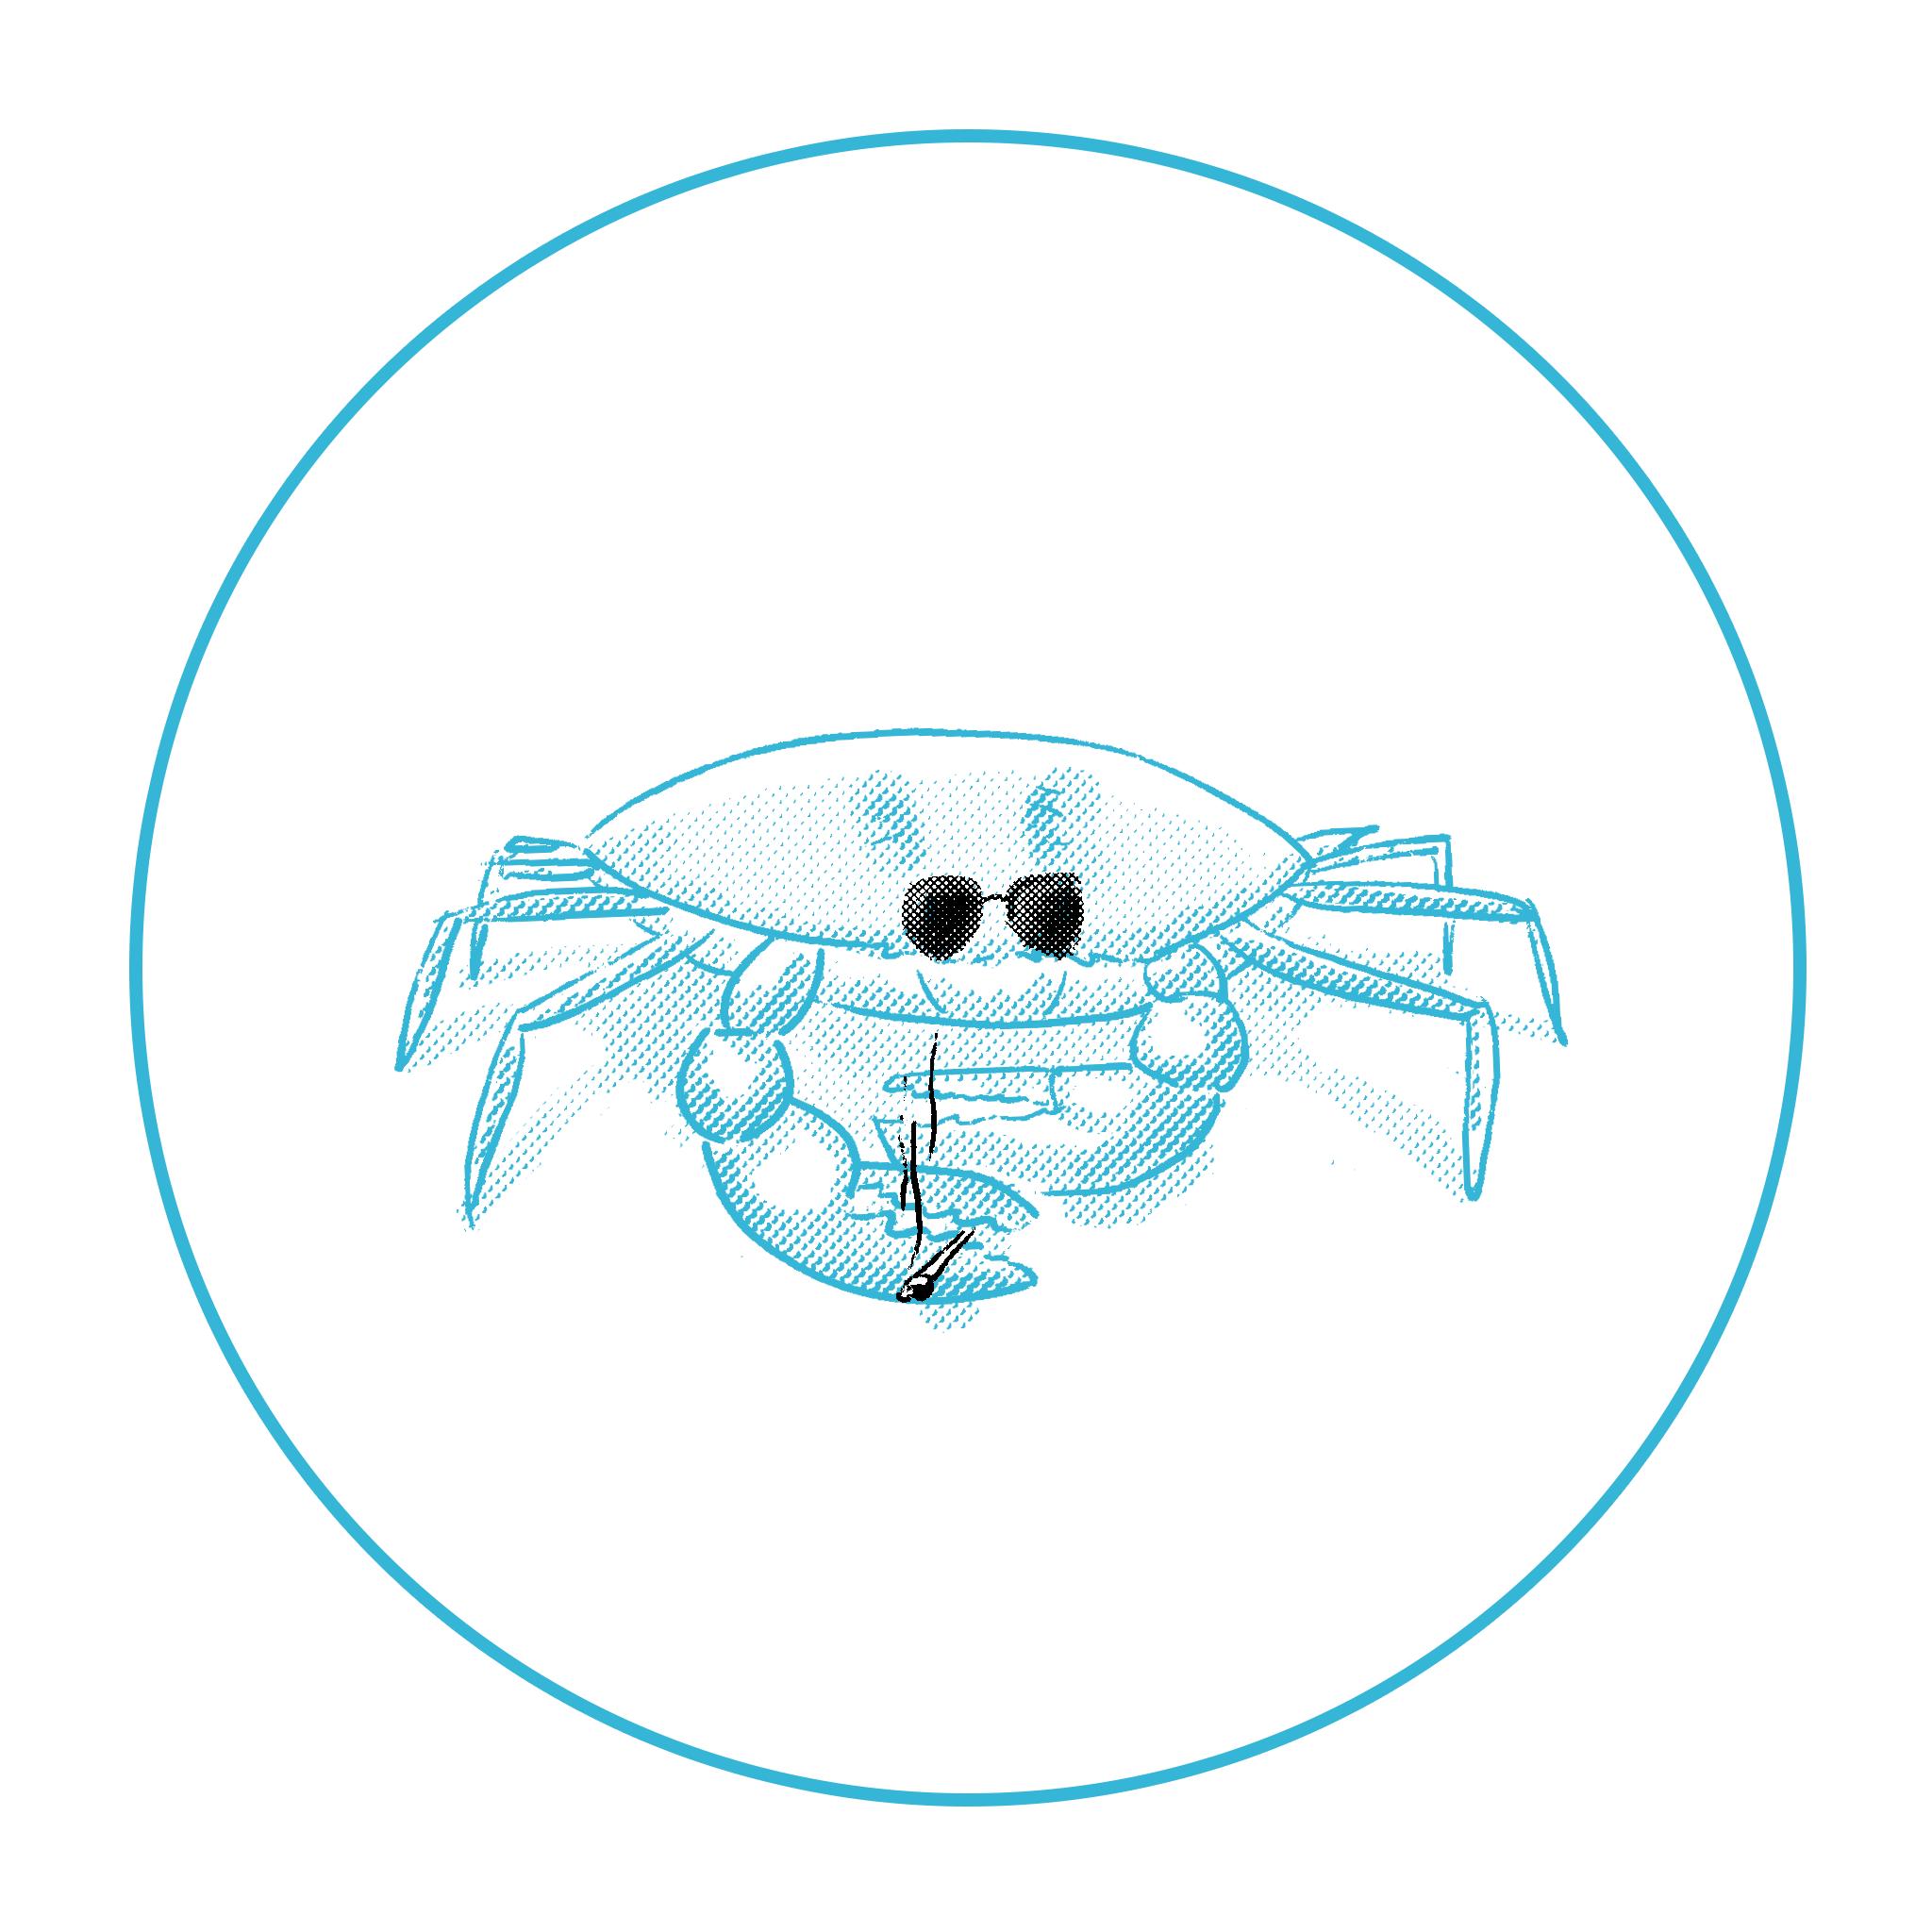 lac-bau-cua_tet-2018_2048x2048_190105_nh_v2.1_crab.png